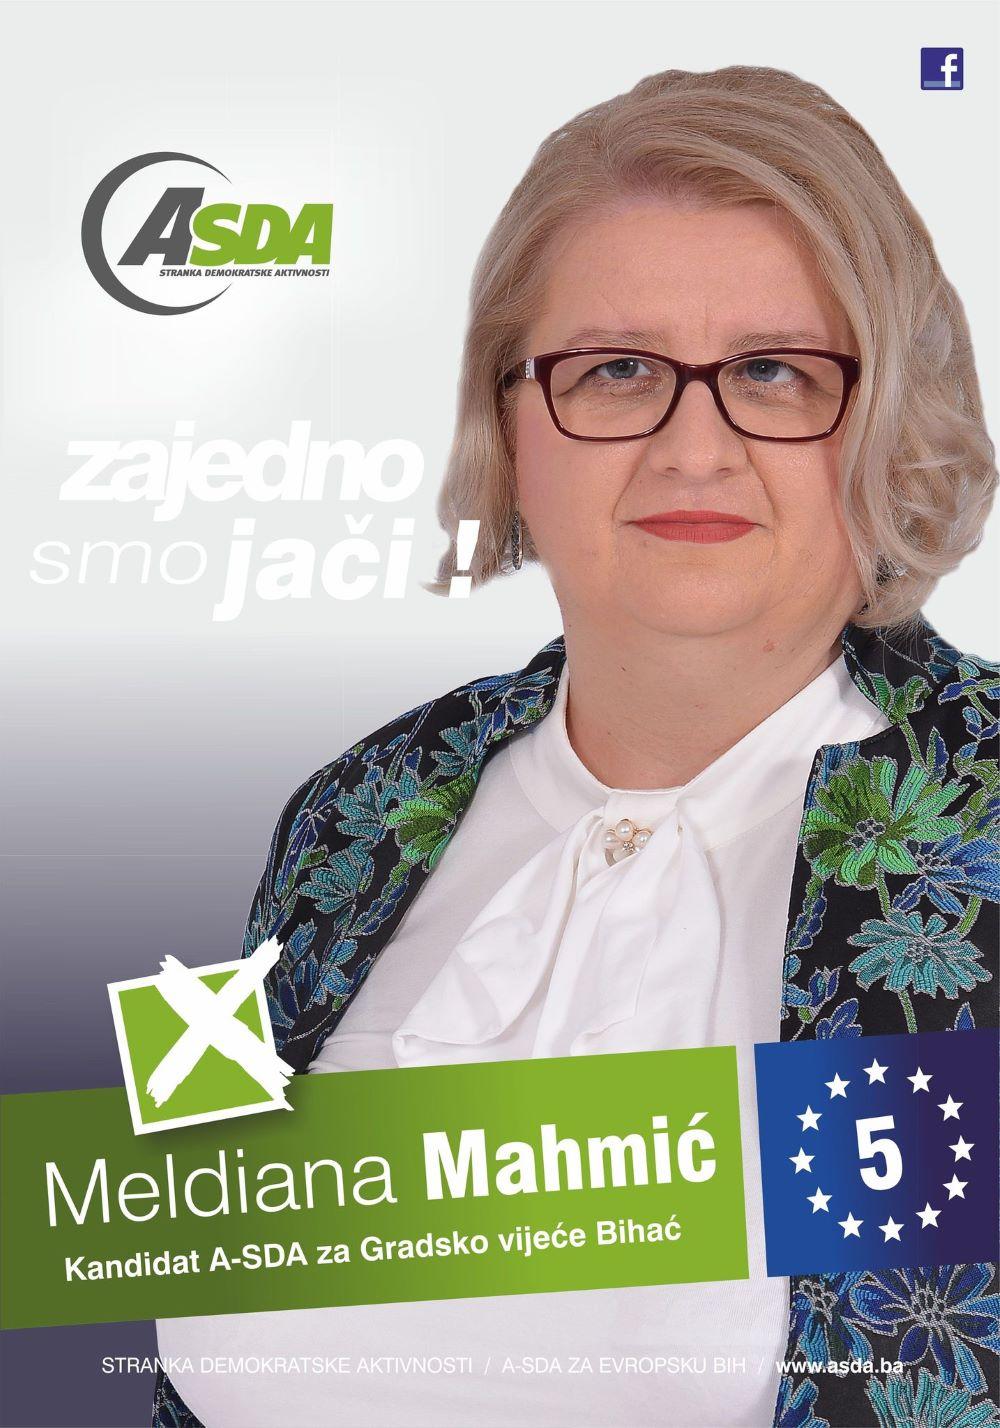 Meldiana Mahmić